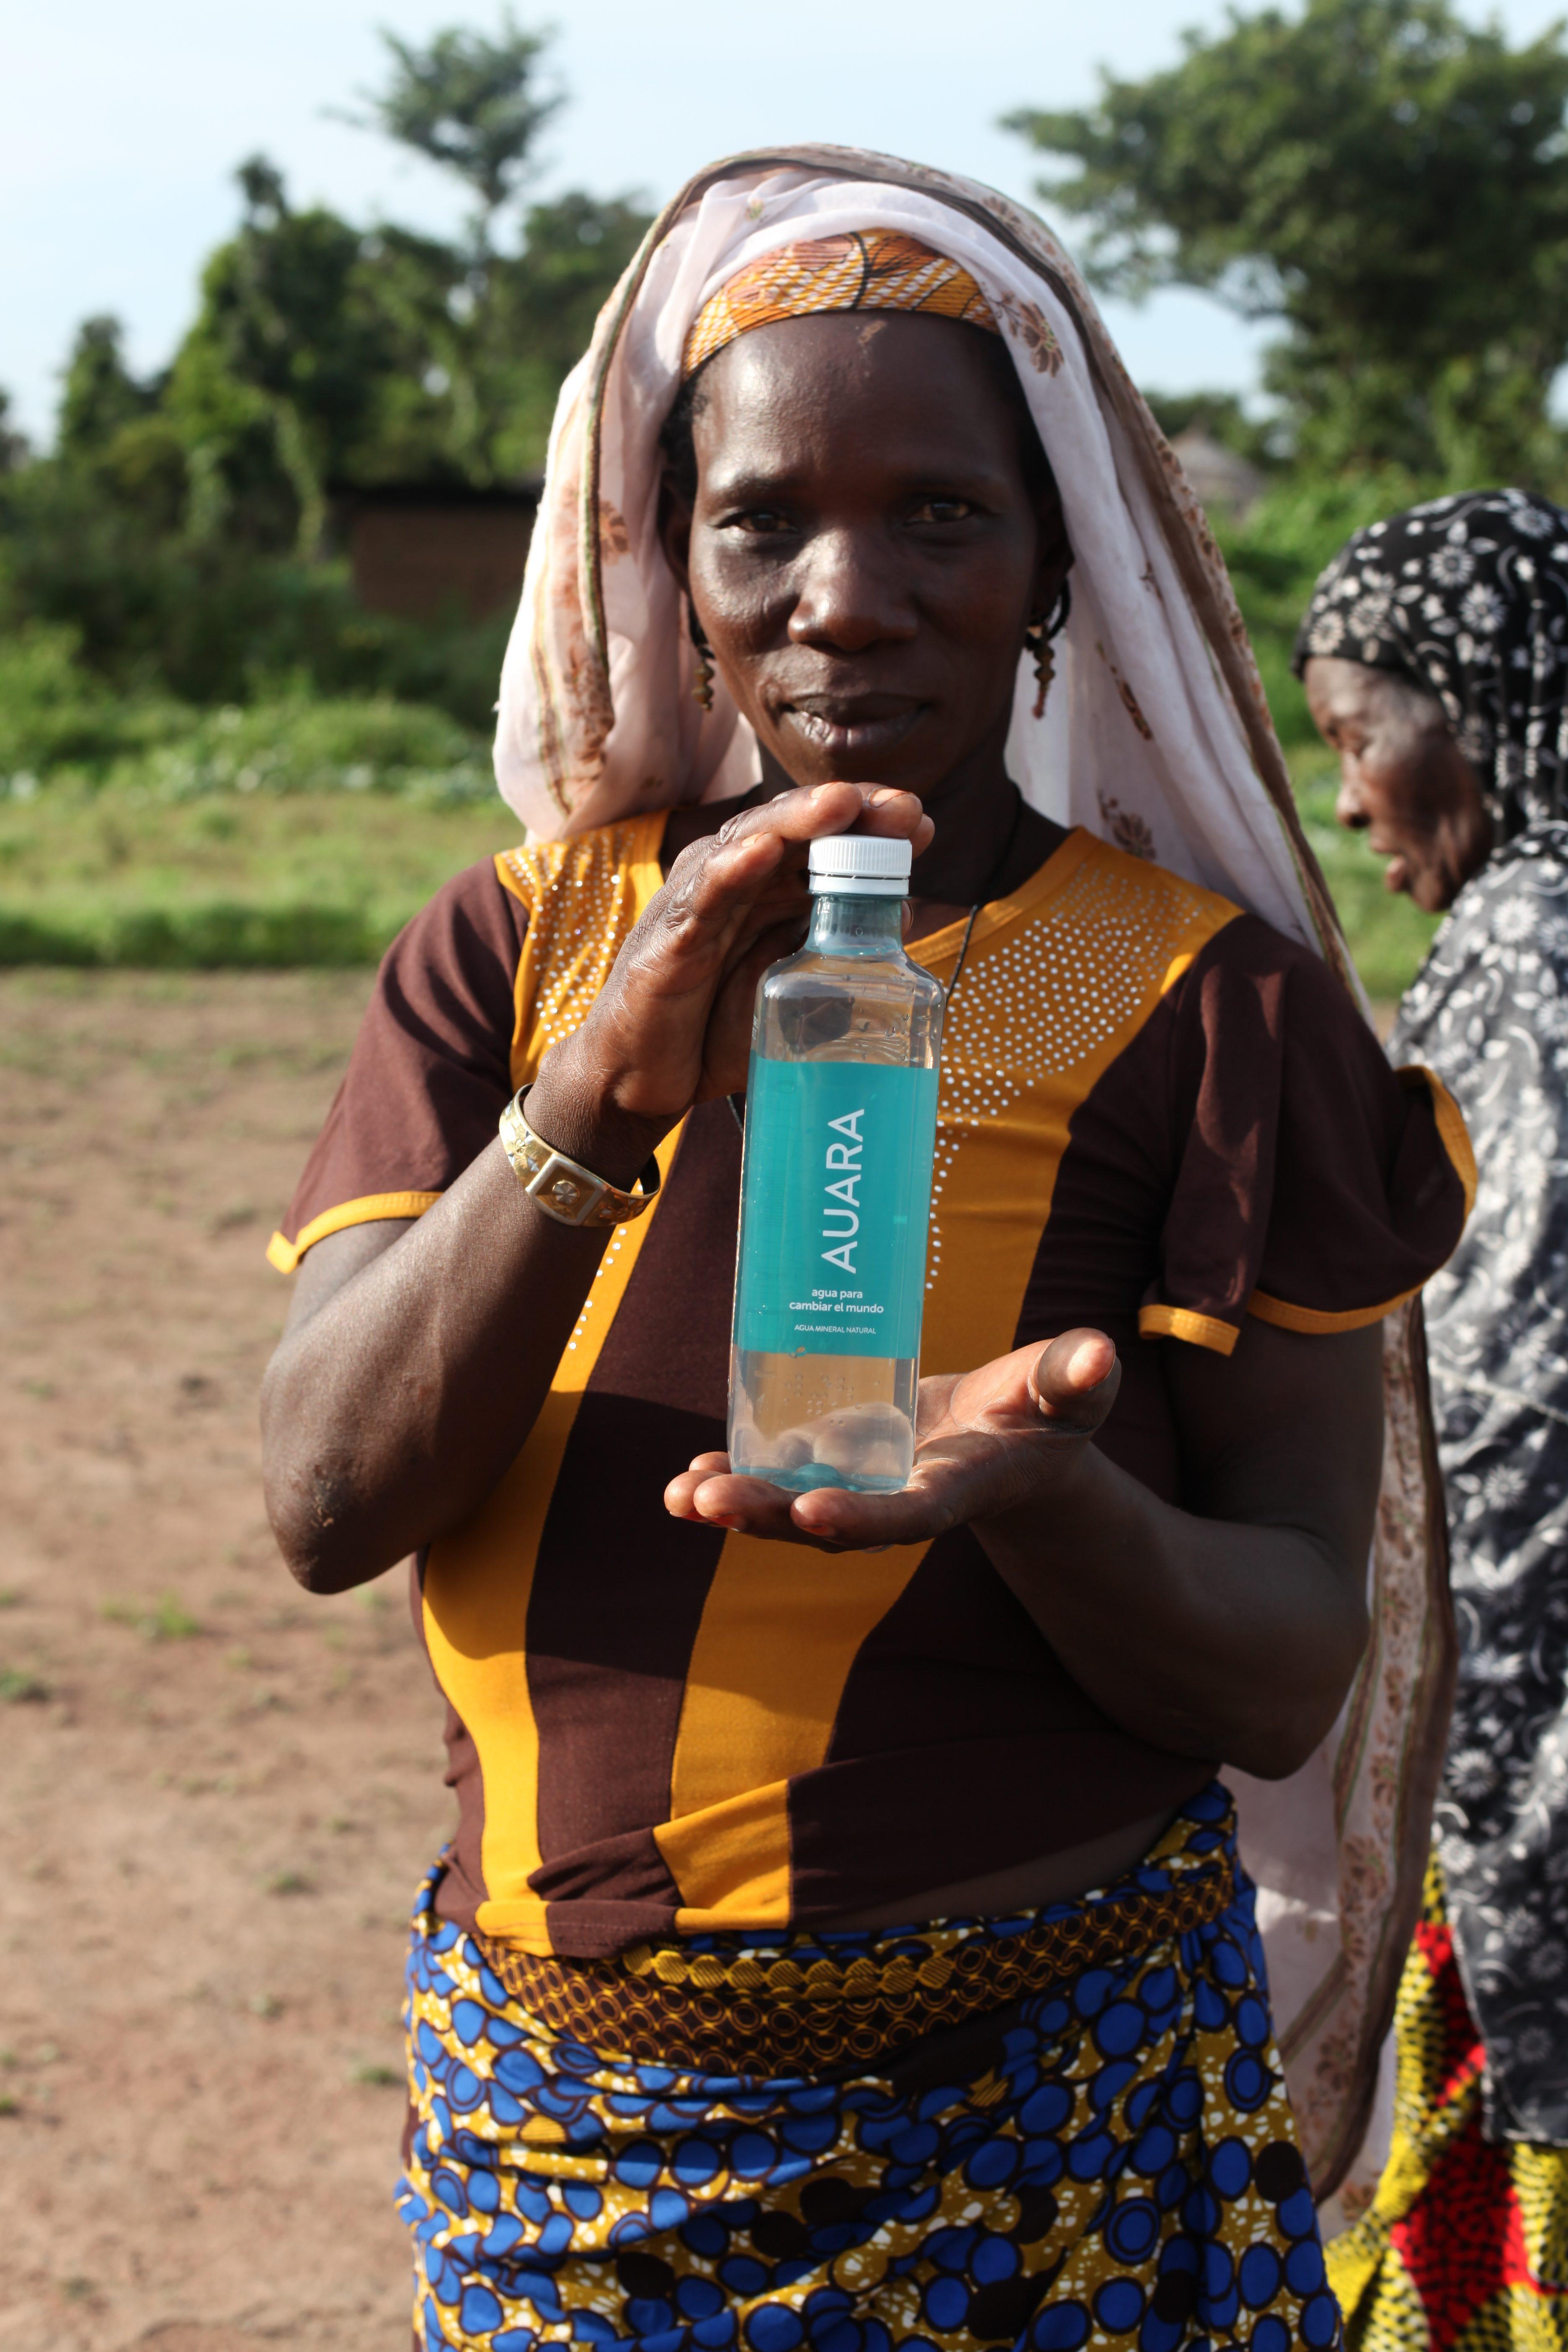 Botella, auara, agua potable